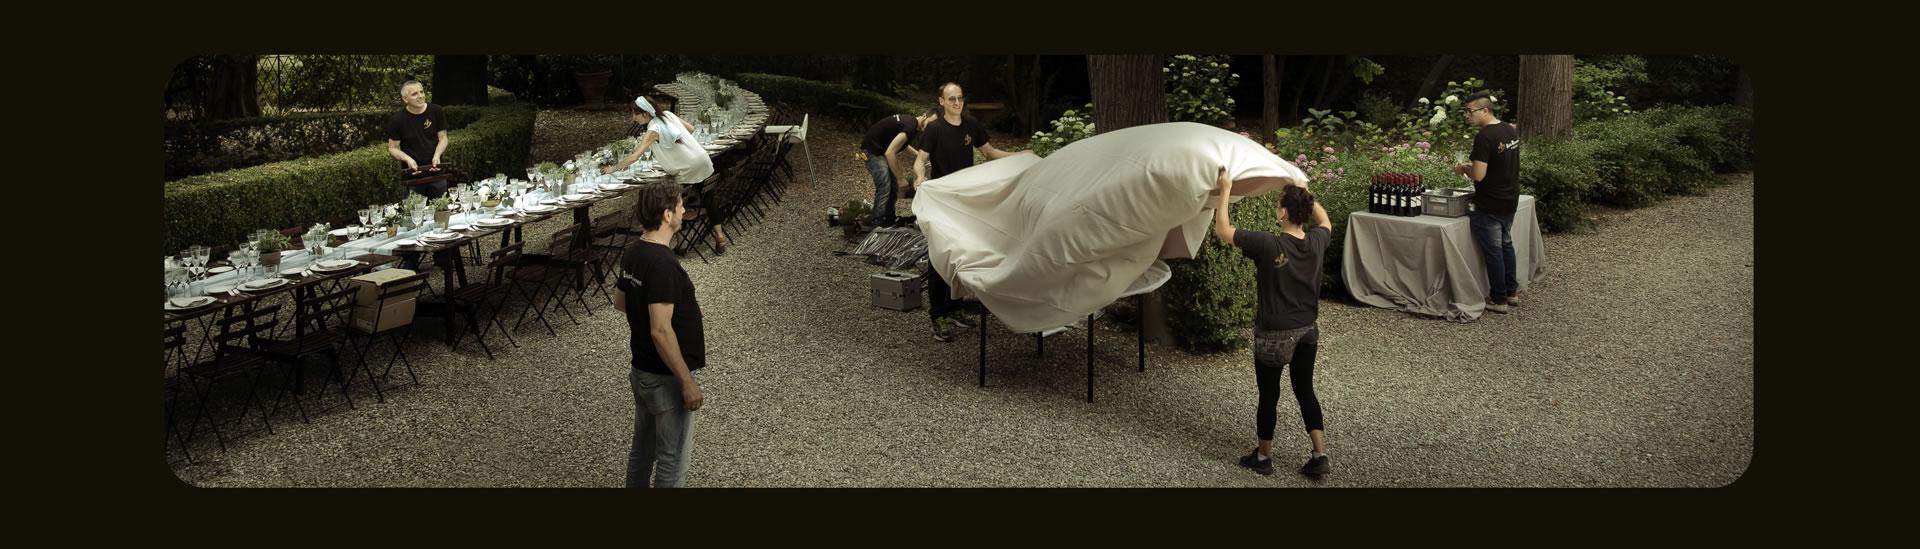 borgo-stomennano-david-bastianoni-photographer-00037 - 37 :: Wedding at Borgo Stomennano // WPPI 2018 // Our love is here to stay :: Luxury wedding photography - 36 :: borgo-stomennano-david-bastianoni-photographer-00037 - 37